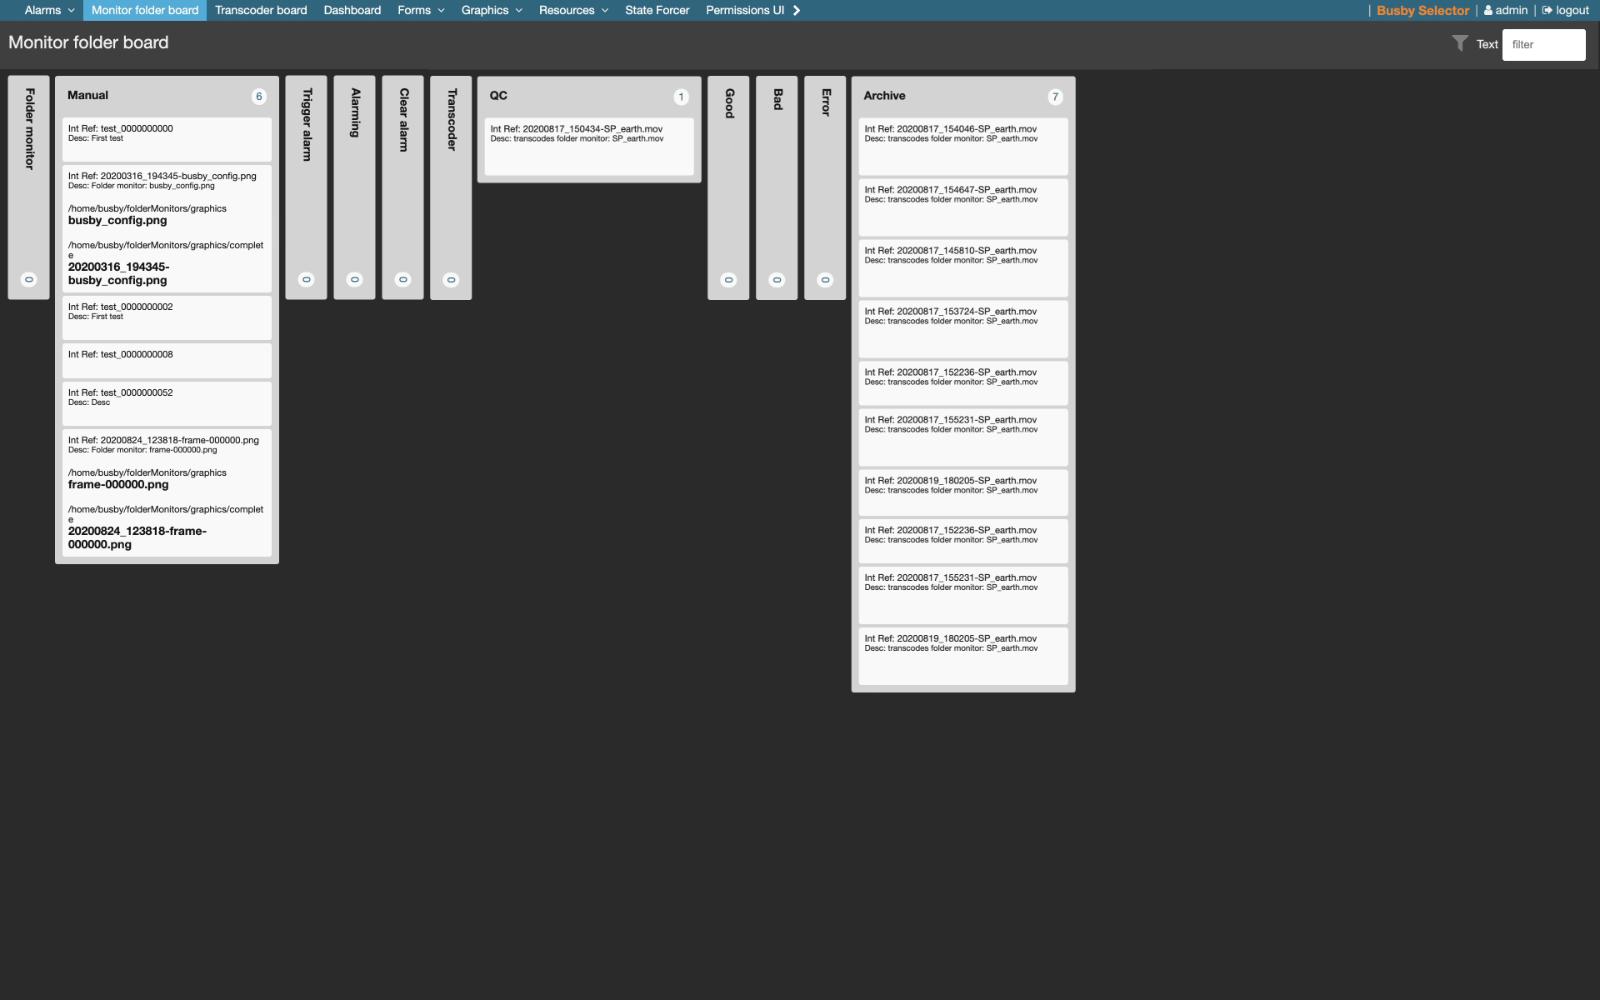 busby_selector_board1_screenshot